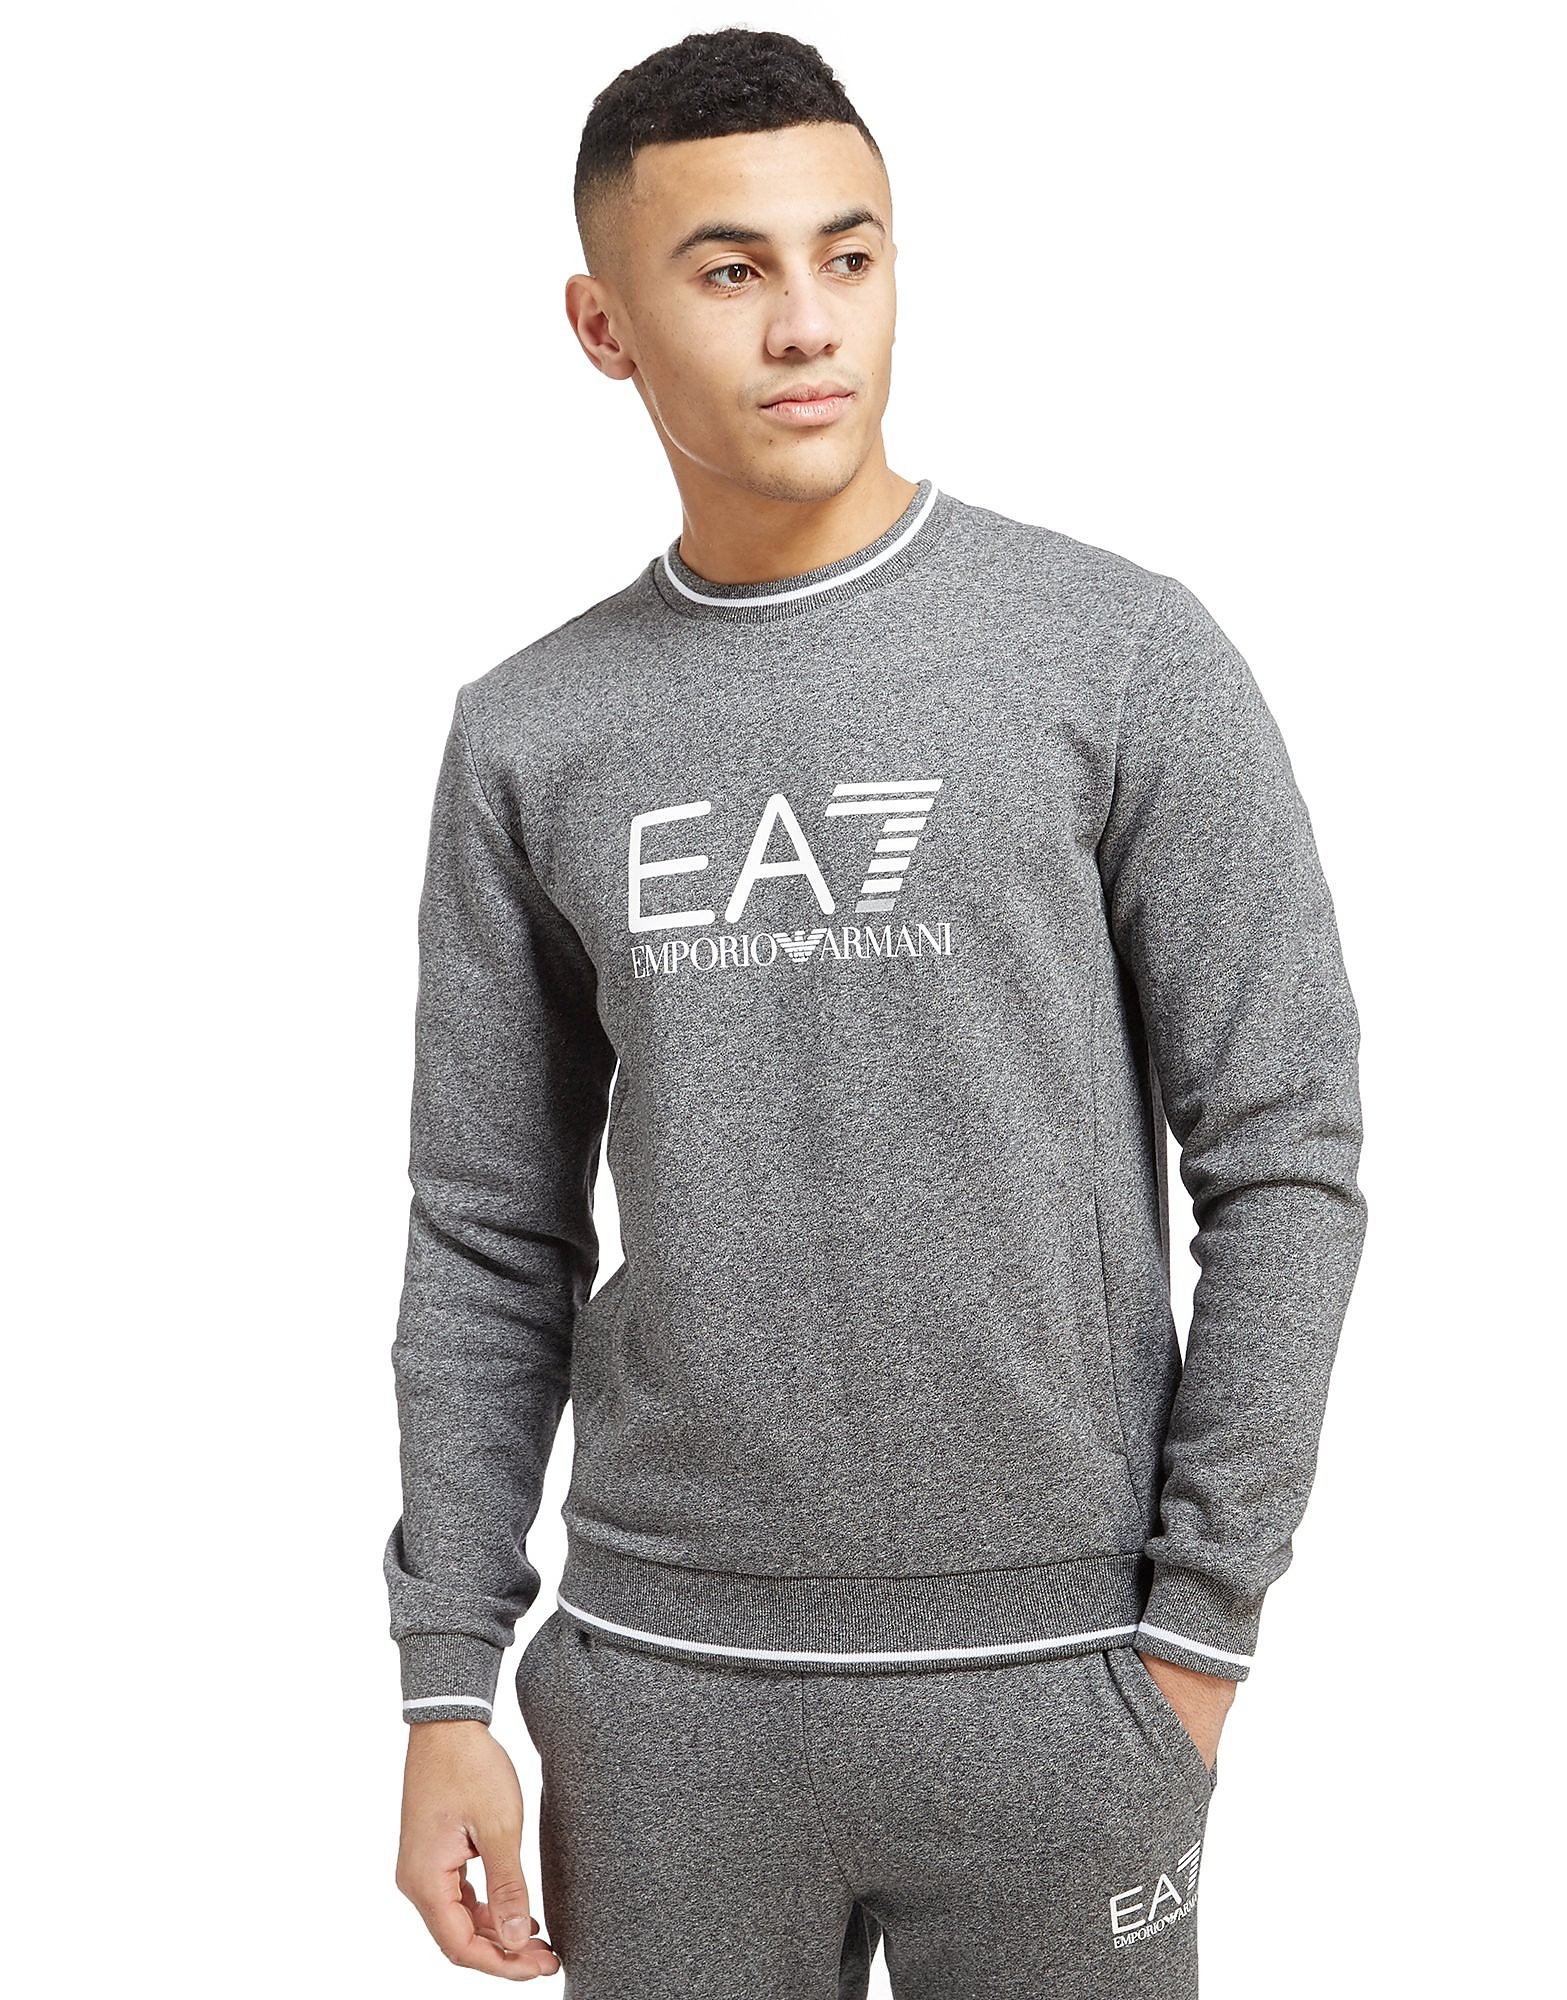 Emporio Armani EA7 Core Ringer Sweatshirt